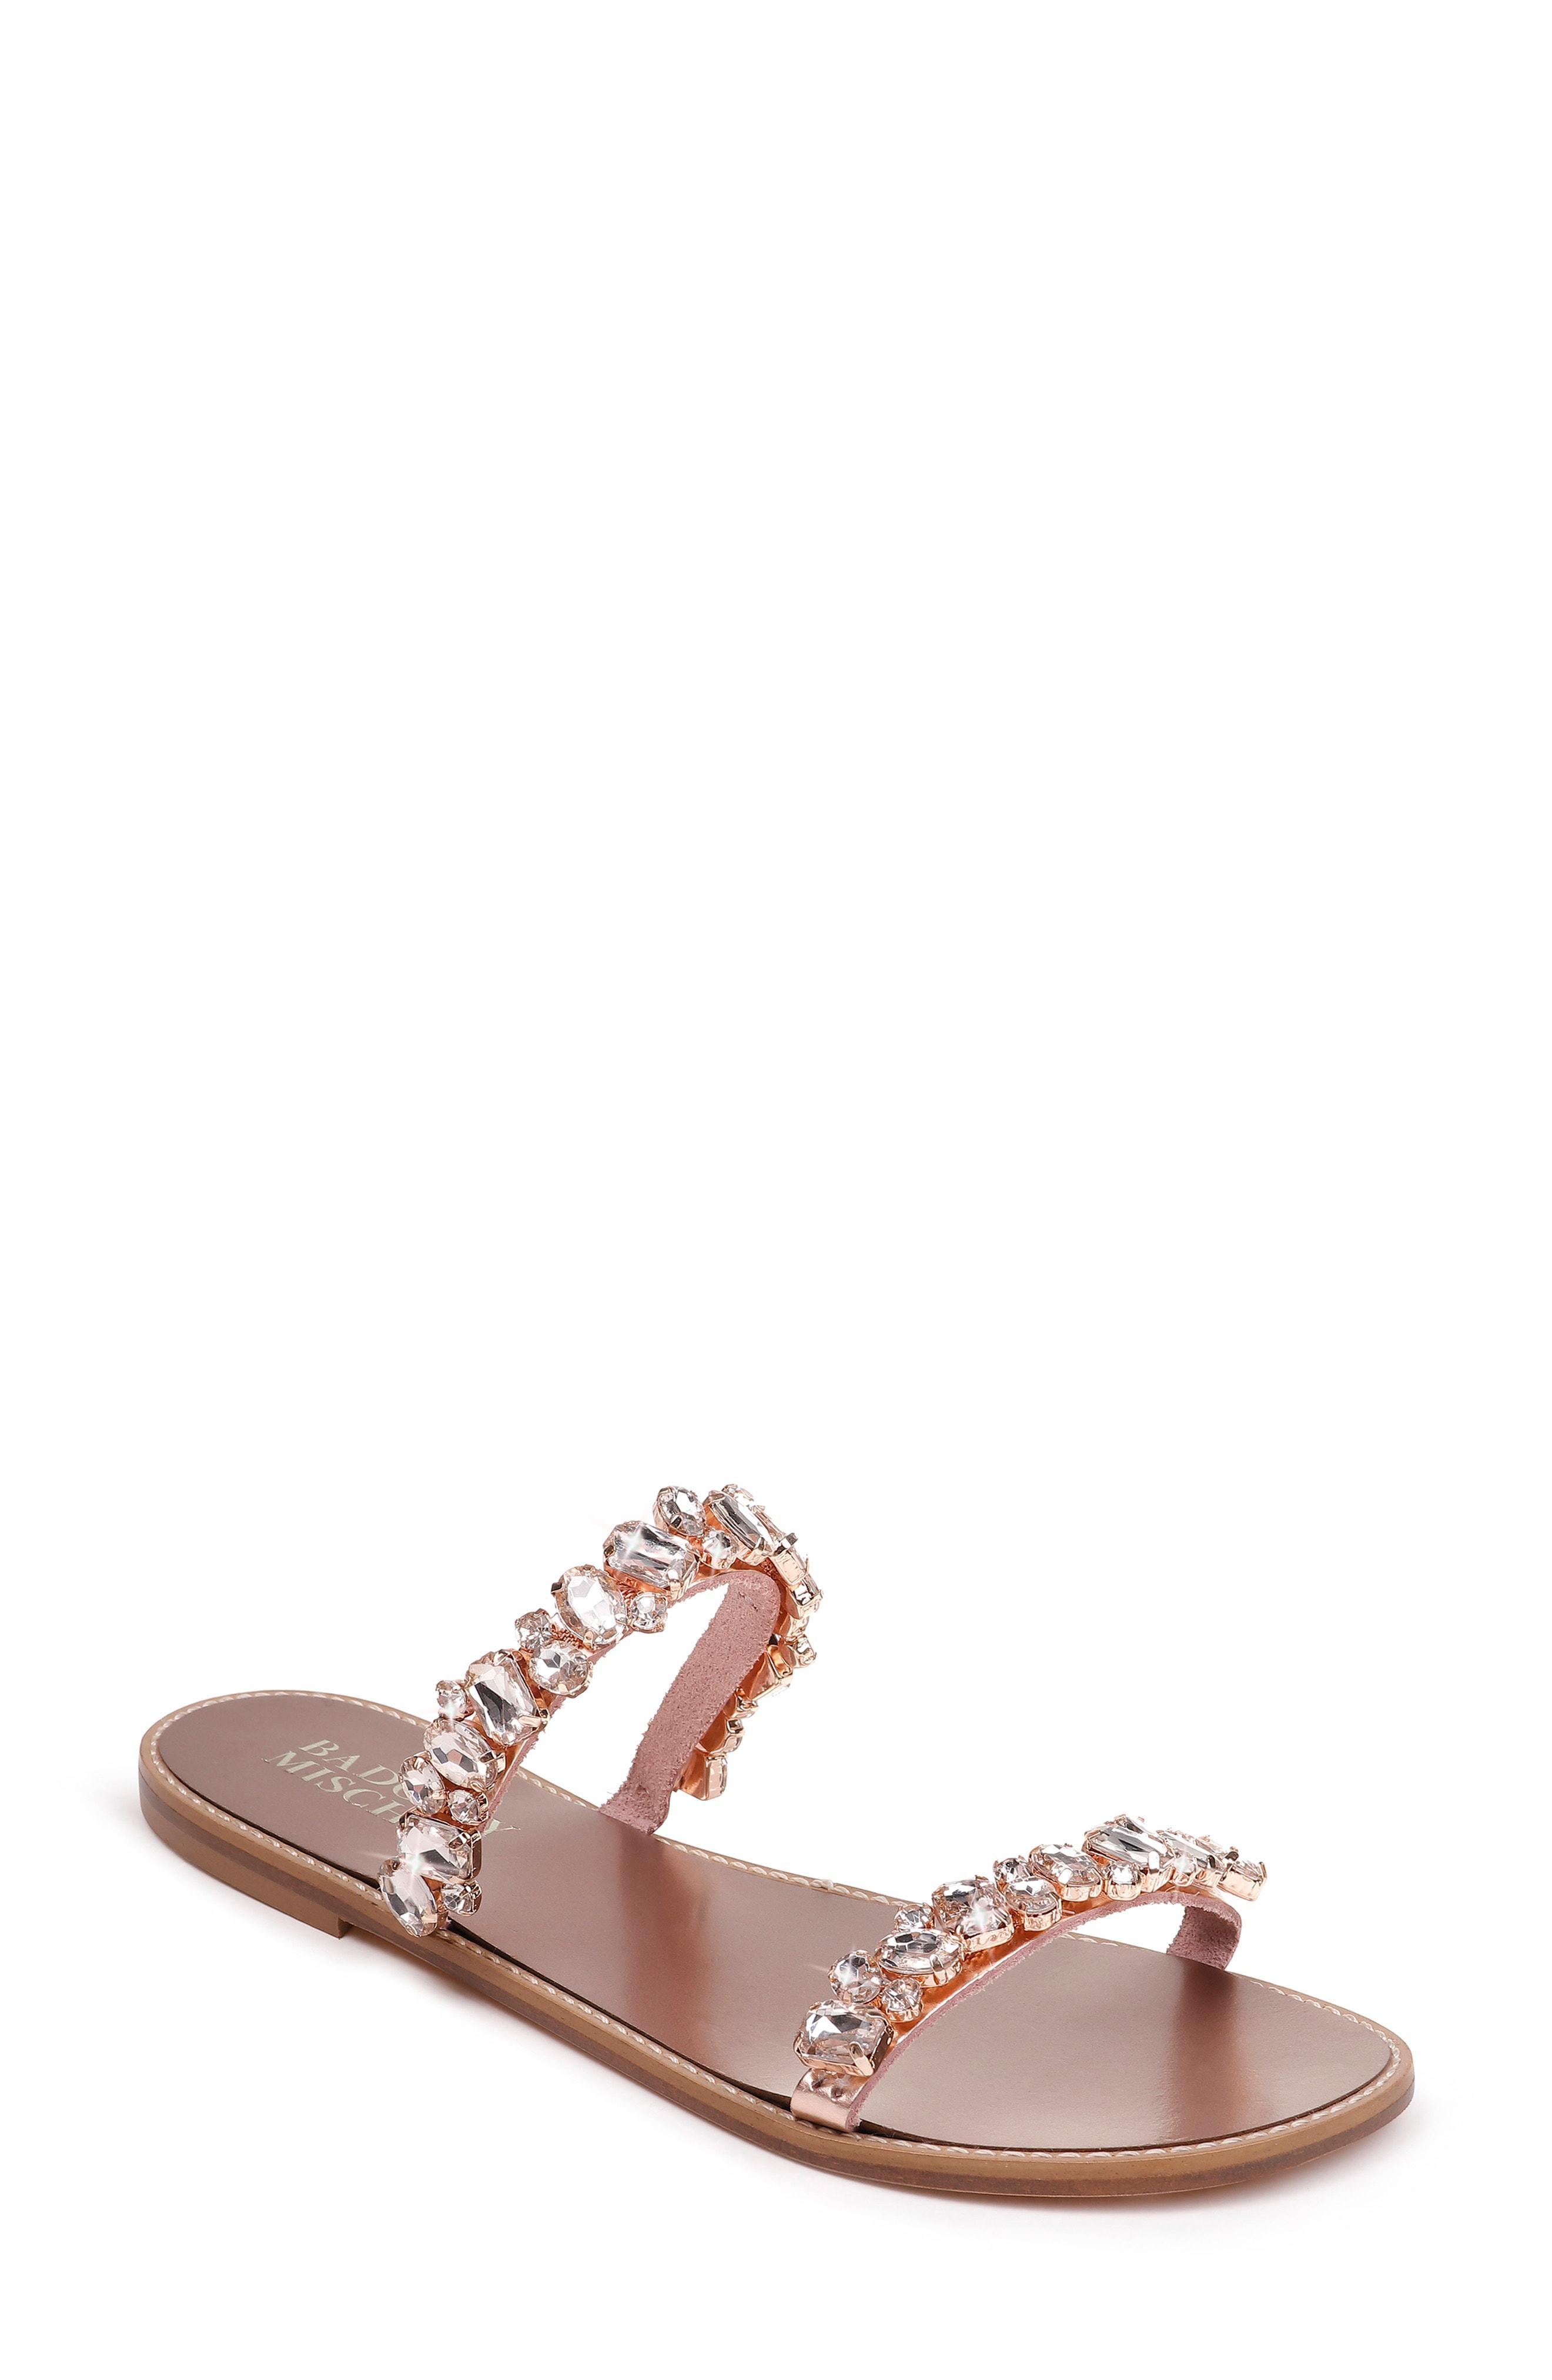 91c6adc0e9e Badgley Mischka. Women s Pink Badgley Mischka Loveday Crystal Embellished  Slide Sandal